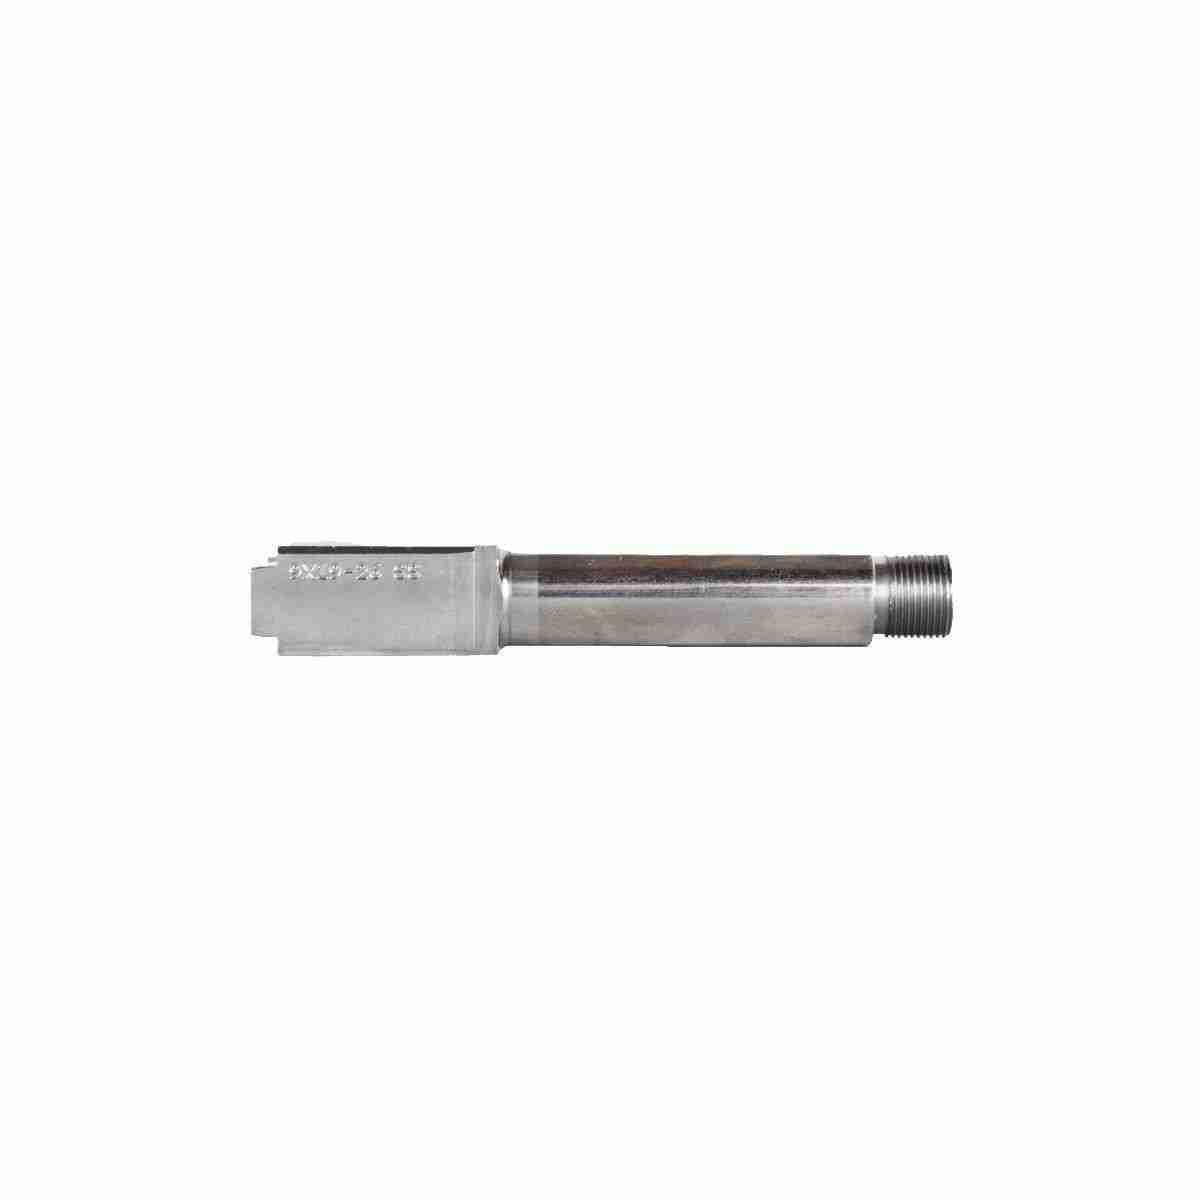 Glock 26 Stainless Steel Threaded Barrel